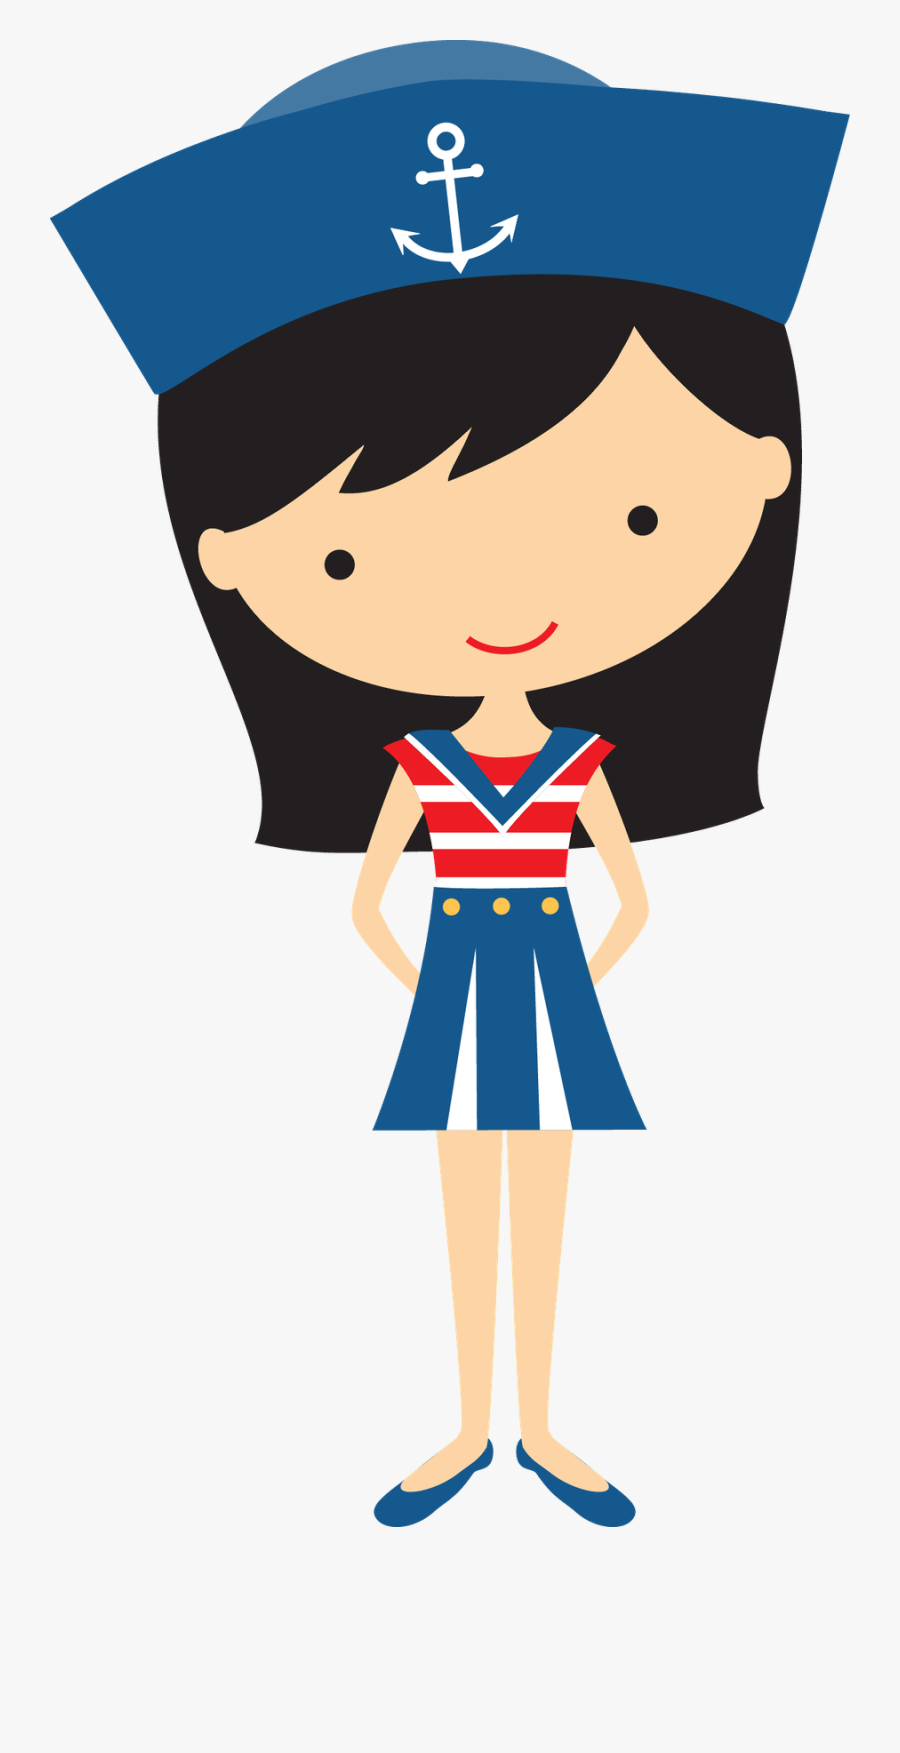 Sailor Girl Clipart, Transparent Clipart